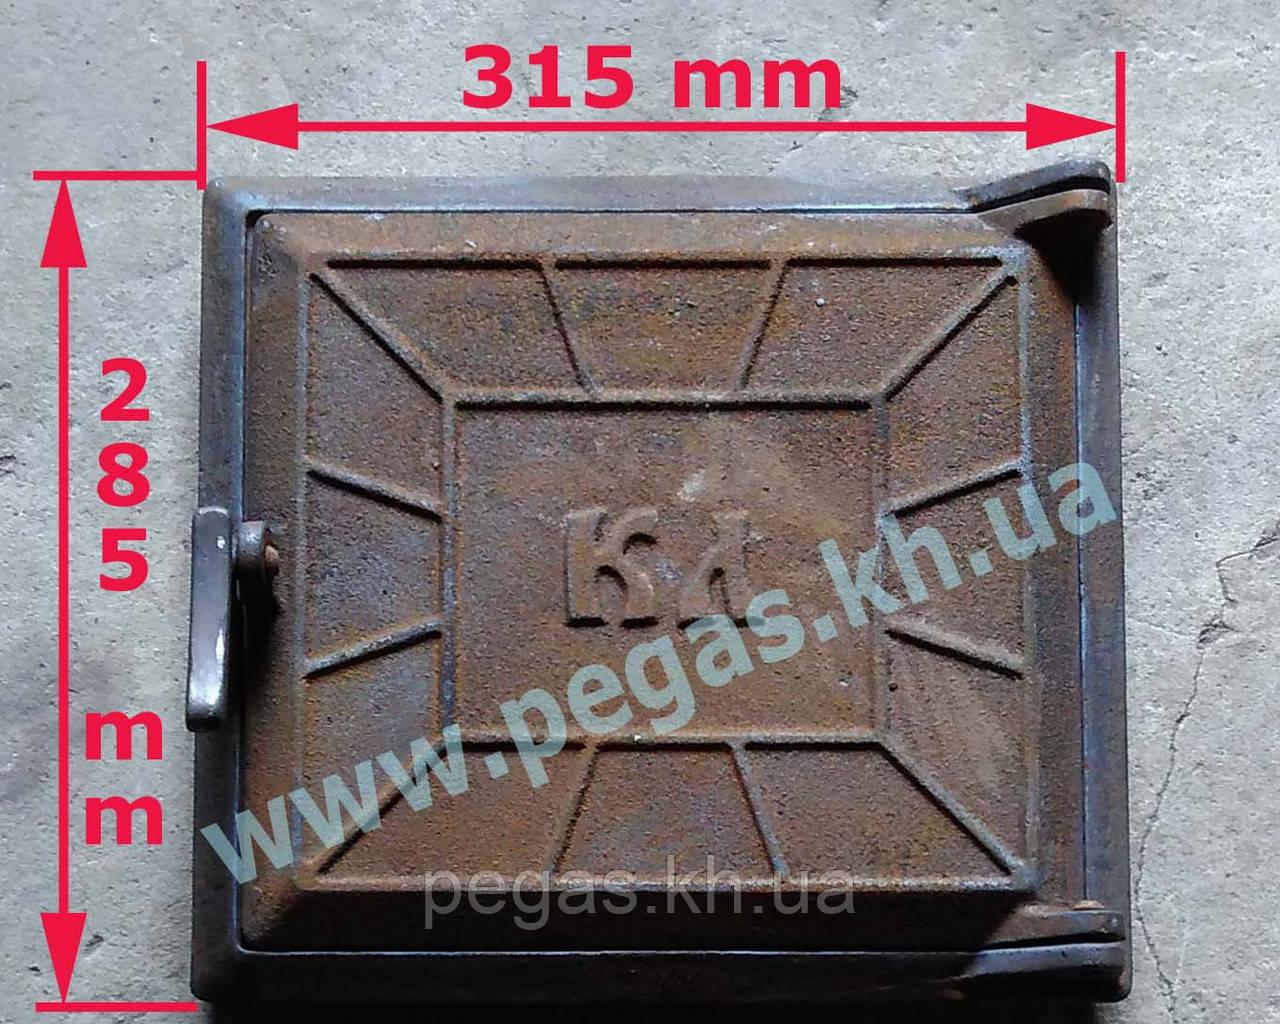 Дверка печная чугунная (285х315мм) печи, барбекю, грубу, мангал